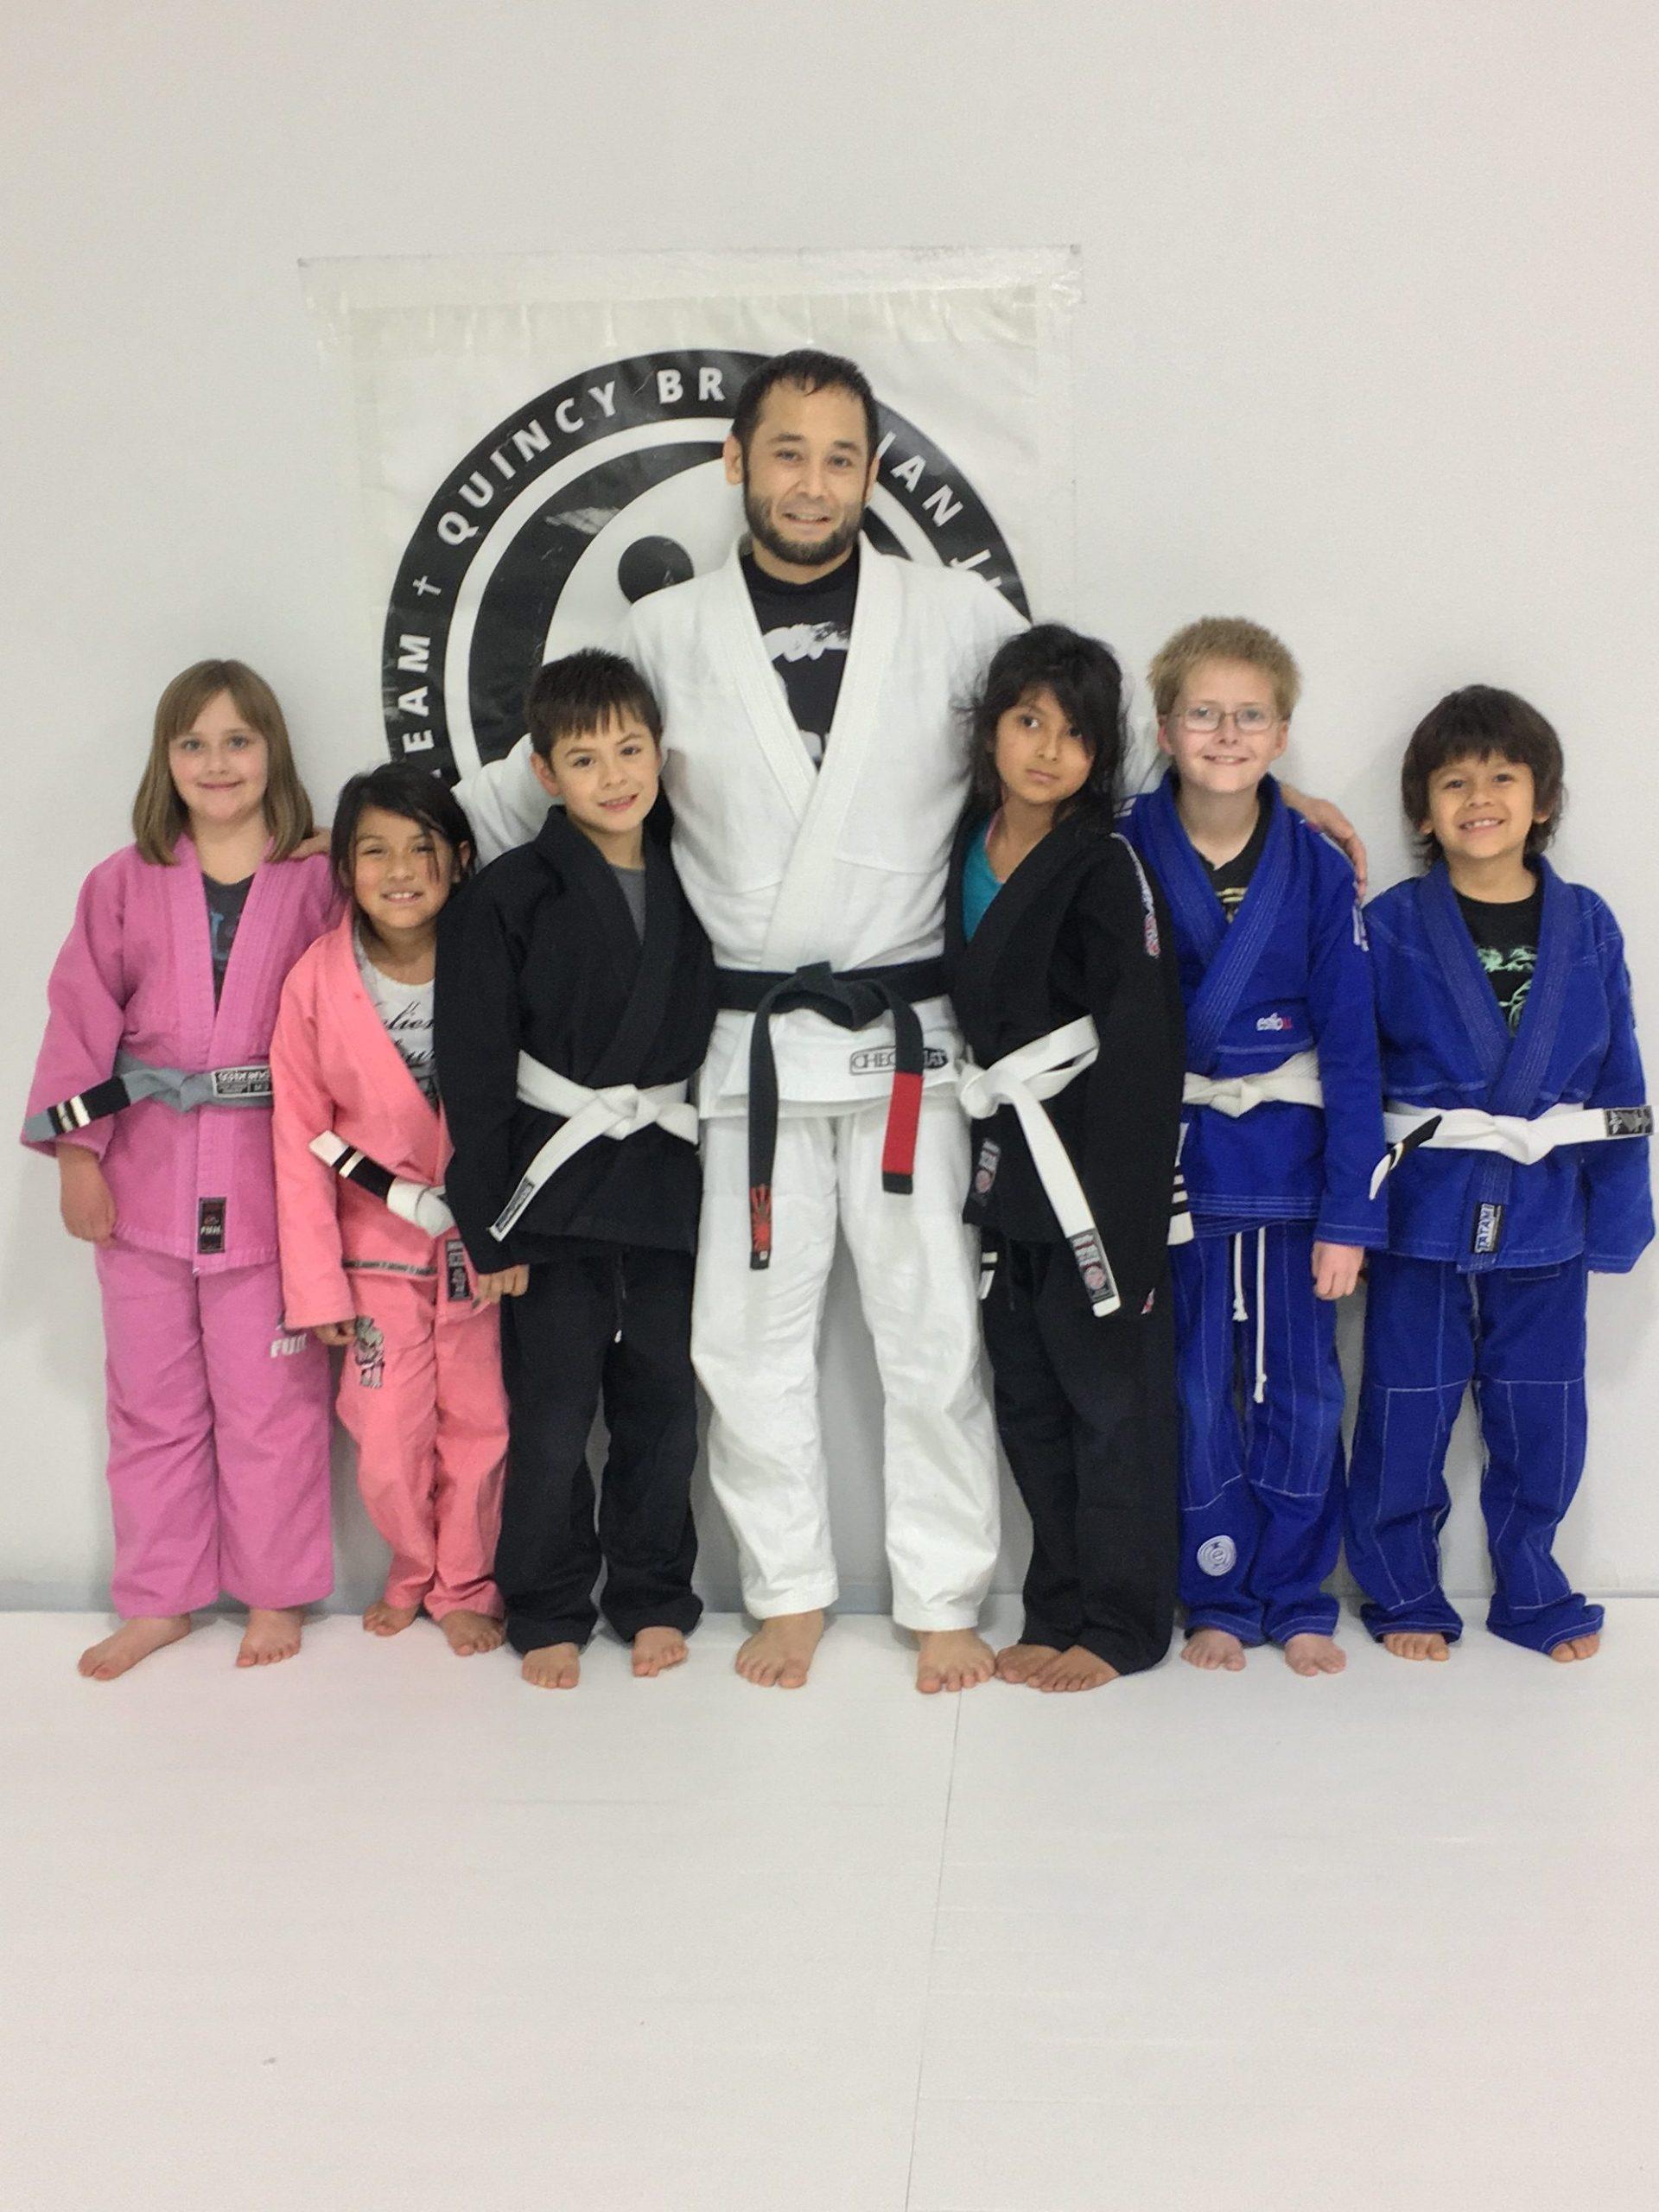 Congratulations to Alexis, Starr, Julian, Alex, Jackson and Asher on Earning Their New Stripes from Quincy Brazilian Jiu-Jitsu